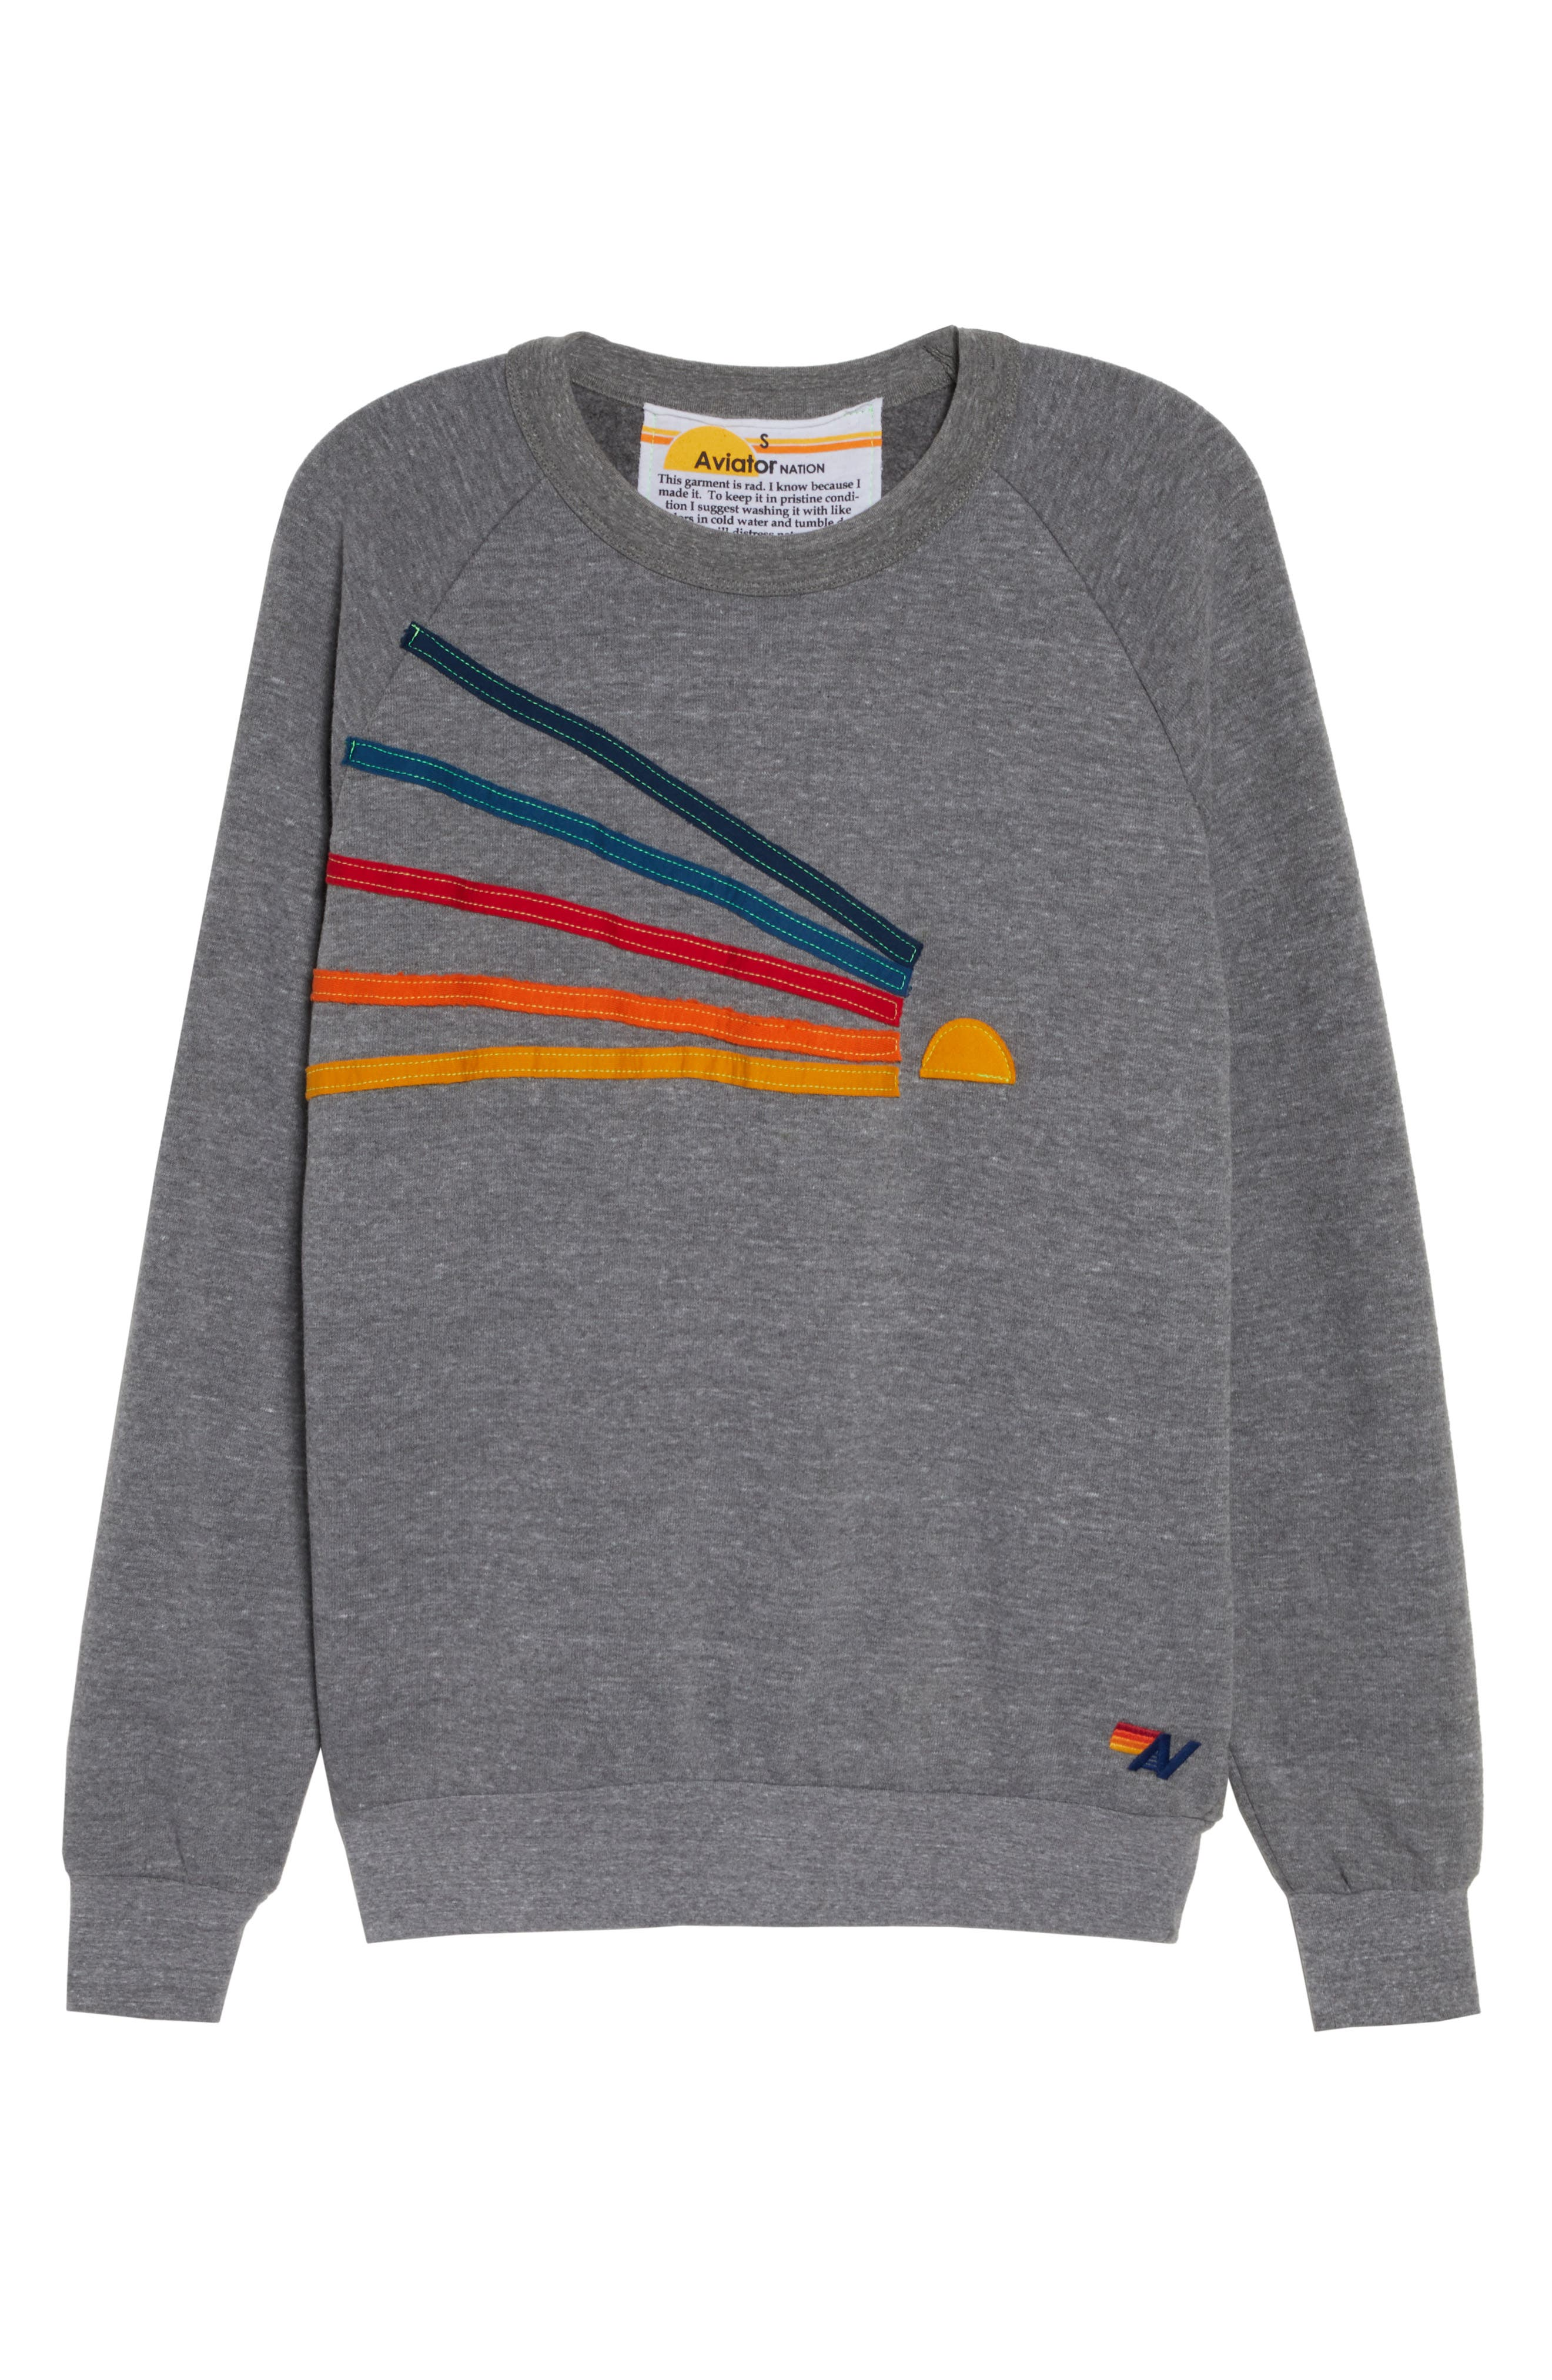 Daydream Sweatshirt,                             Alternate thumbnail 7, color,                             HEATHER GREY